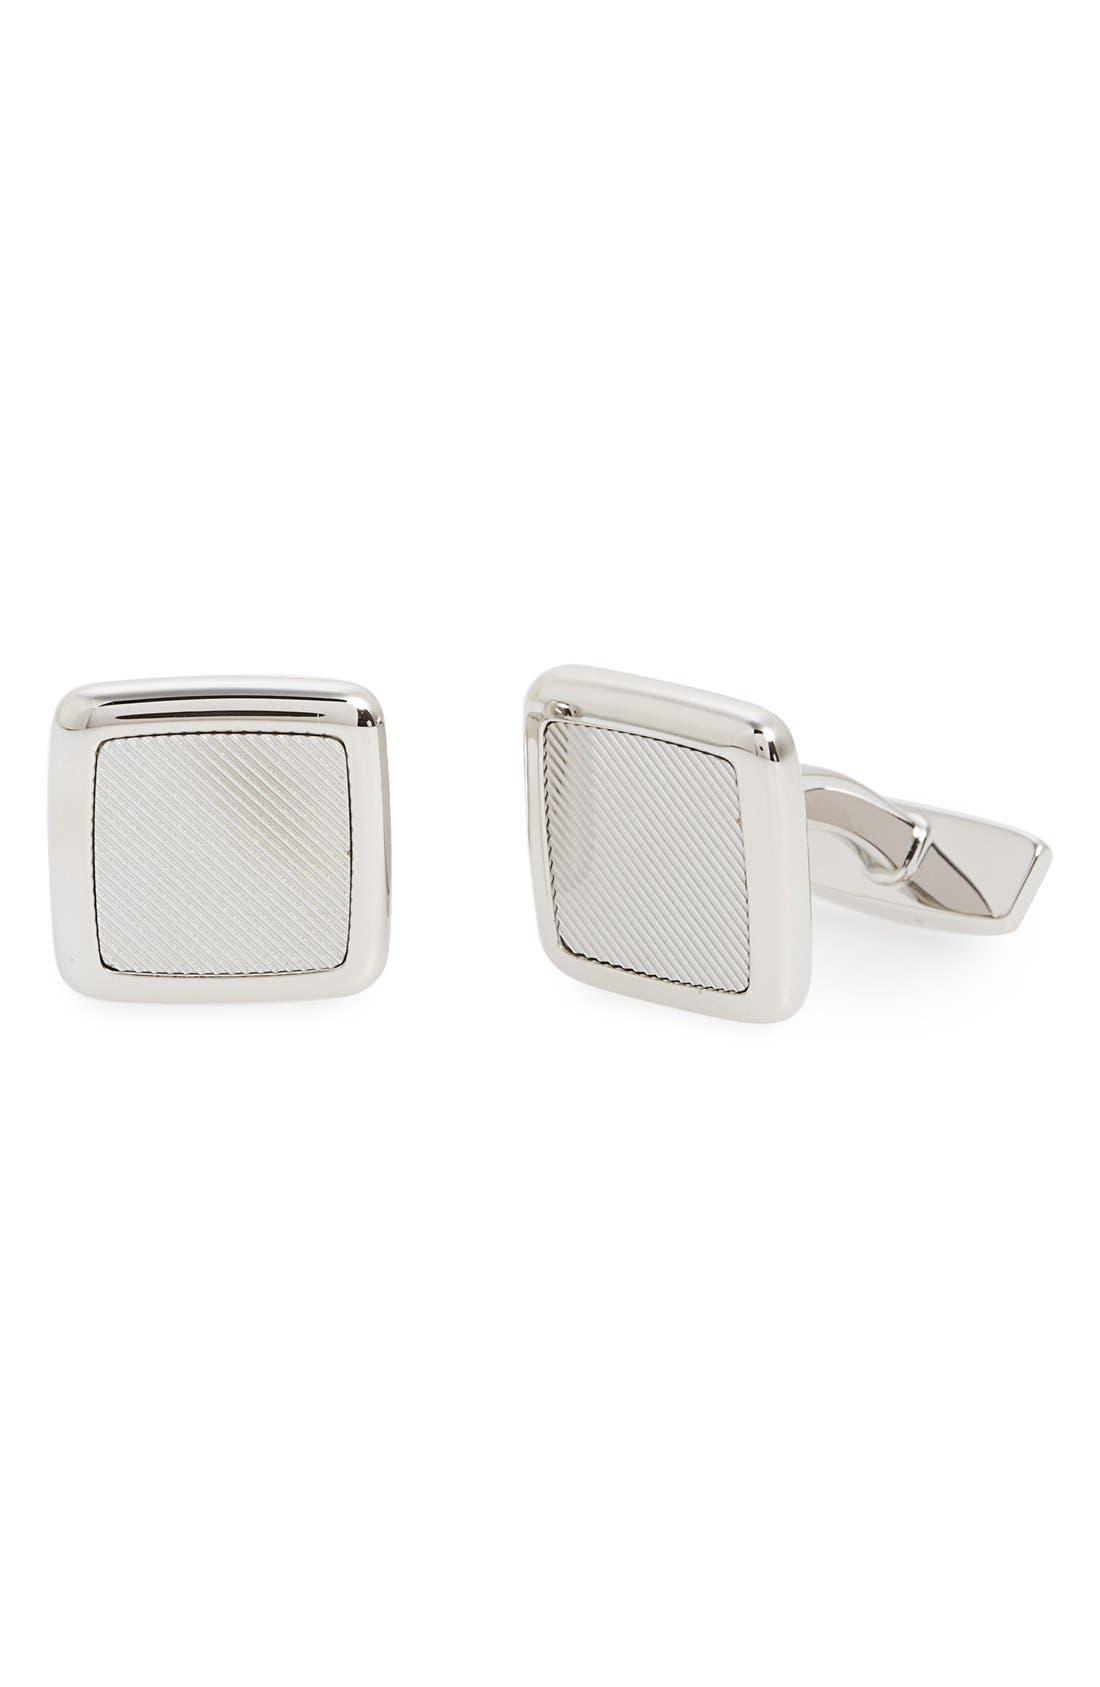 Main Image - BOSS 'Ennio' Cuff Links